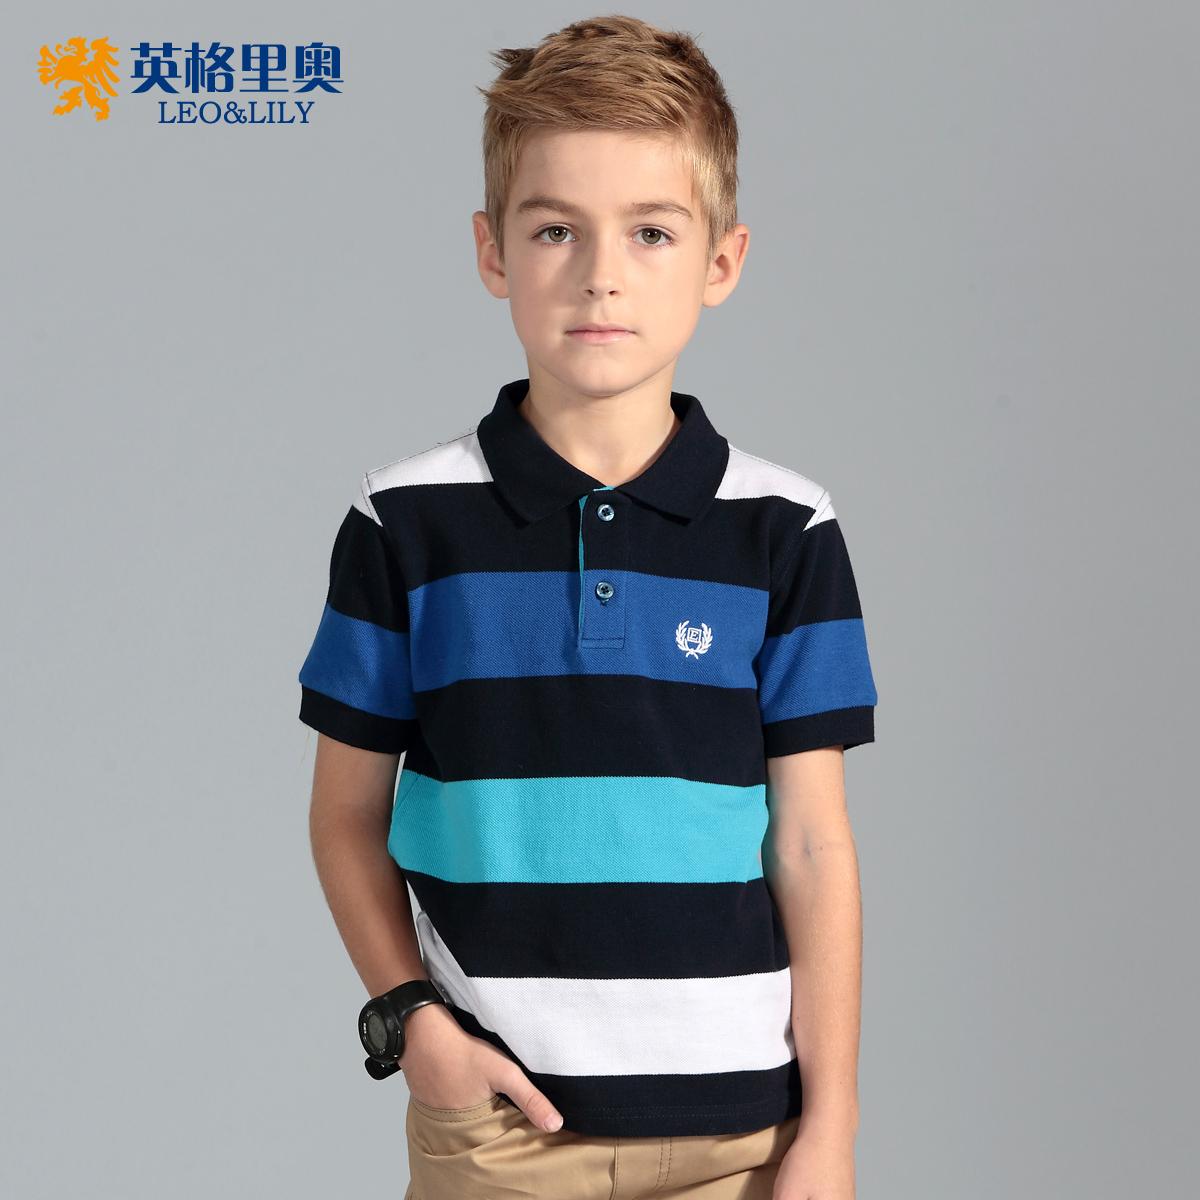 Usd 8135 Childrens Clothing Boys Short Sleeved T Shirt Large